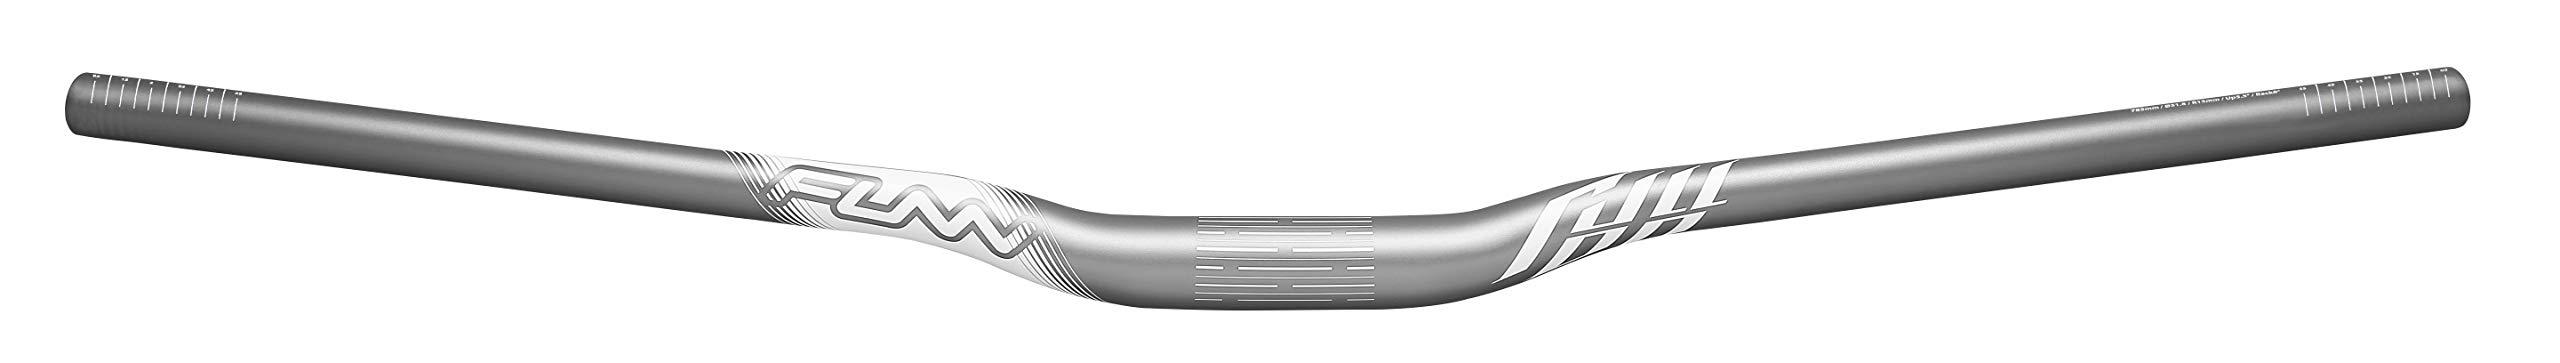 Full On MTB Handlebar, Bar Clamp 31.8mm, Width 785mm (Rise 15mm, Gray) by Funn